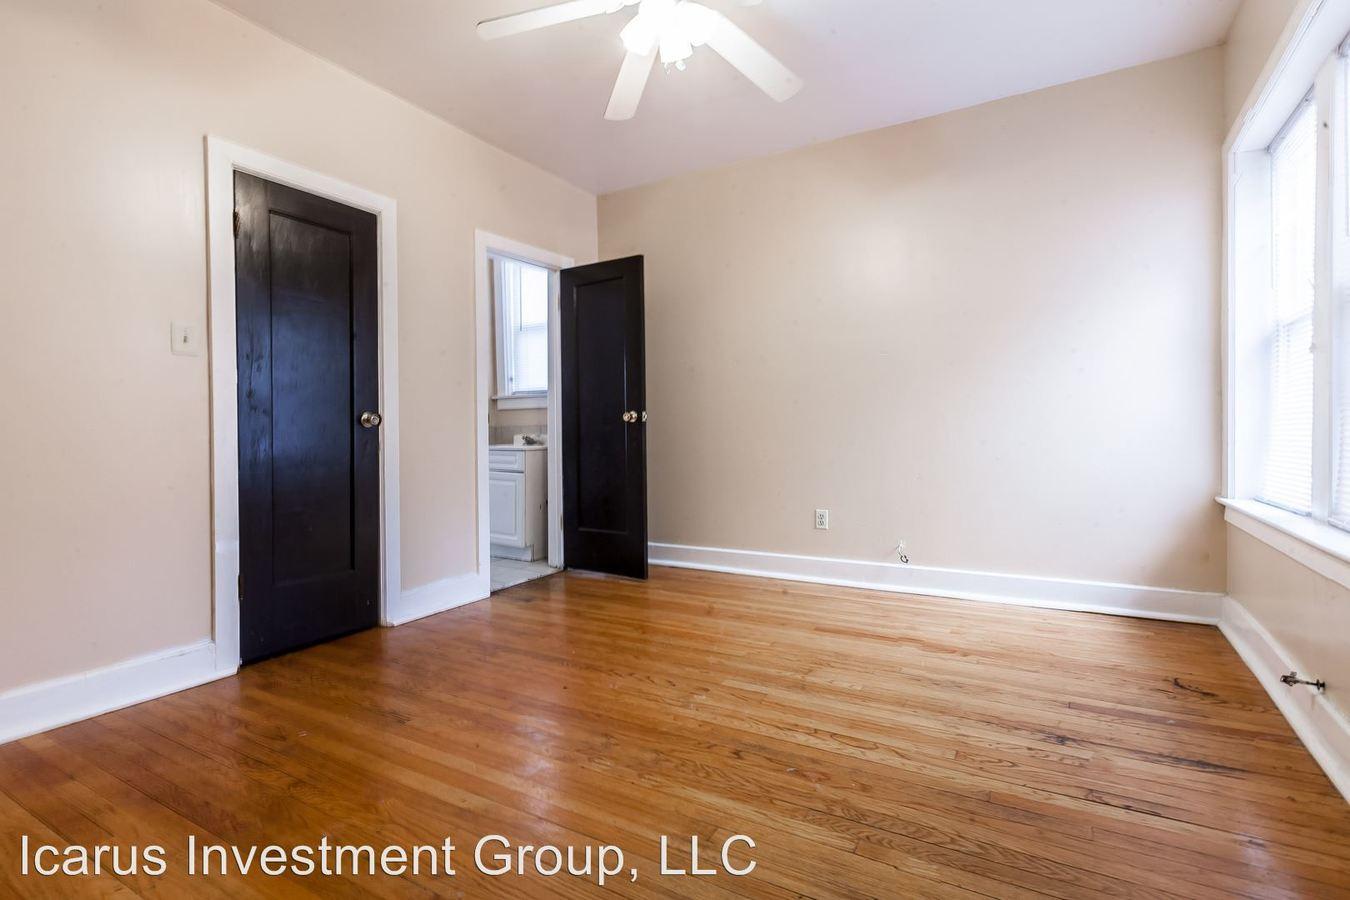 3 Bedrooms 1 Bathroom Apartment for rent at 7736-38 S Colfax Avenue 7736-38 S Colfax Avenue in Chicago, IL